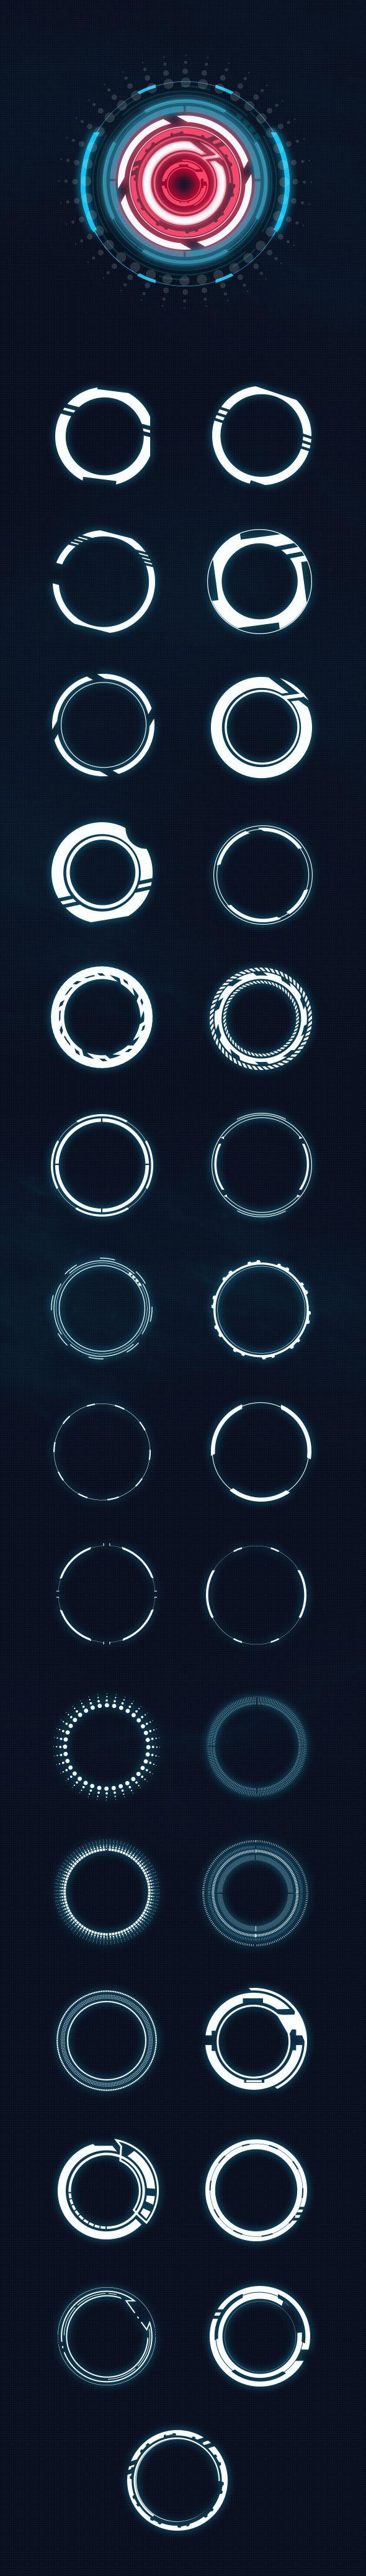 Hi-tech HUD circles - Custom Shapes - Shapes Photoshop